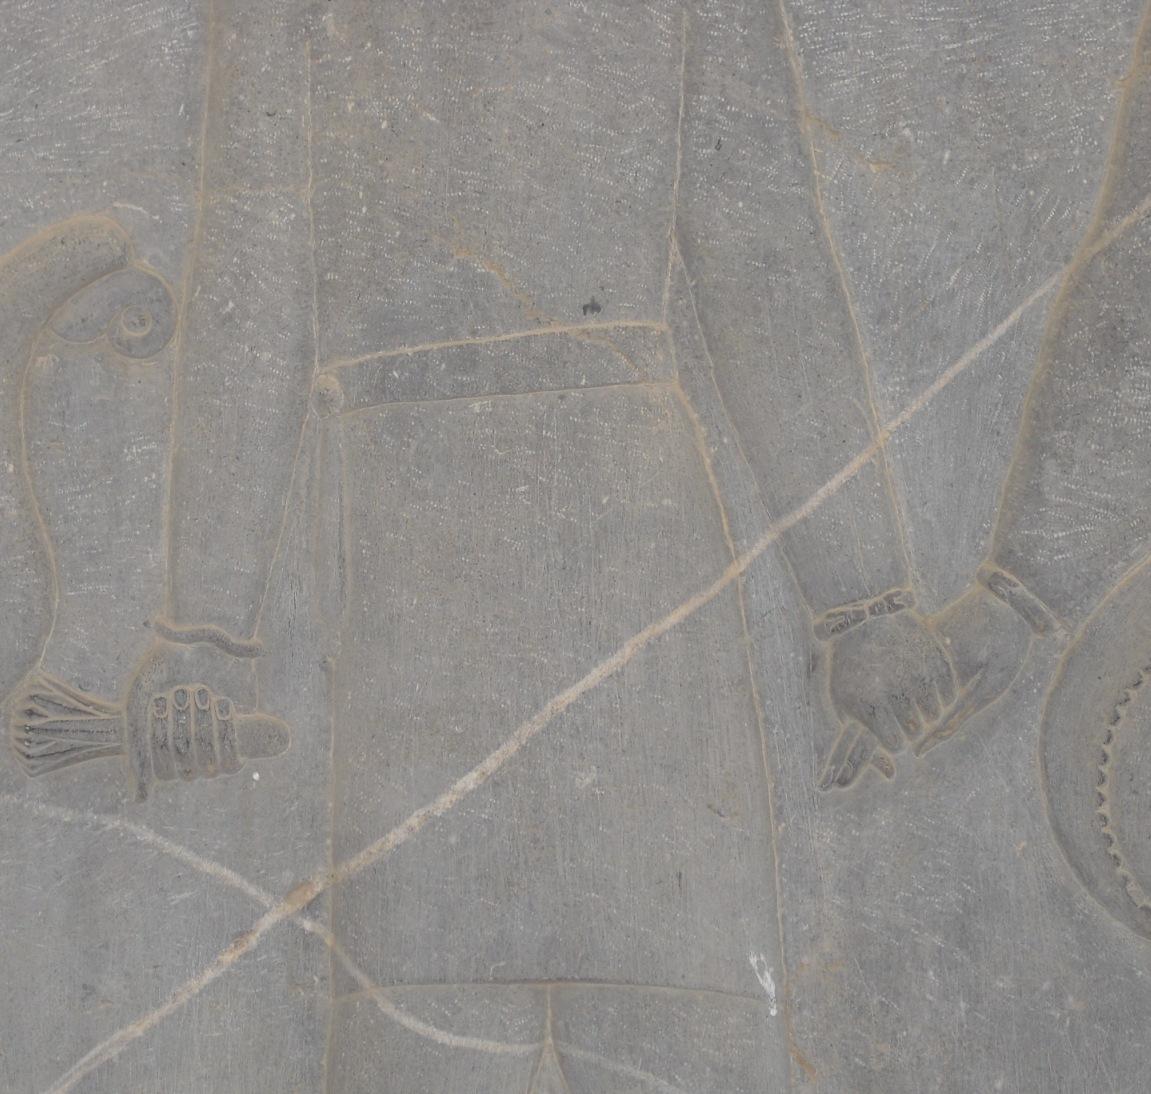 Persepolis Hände